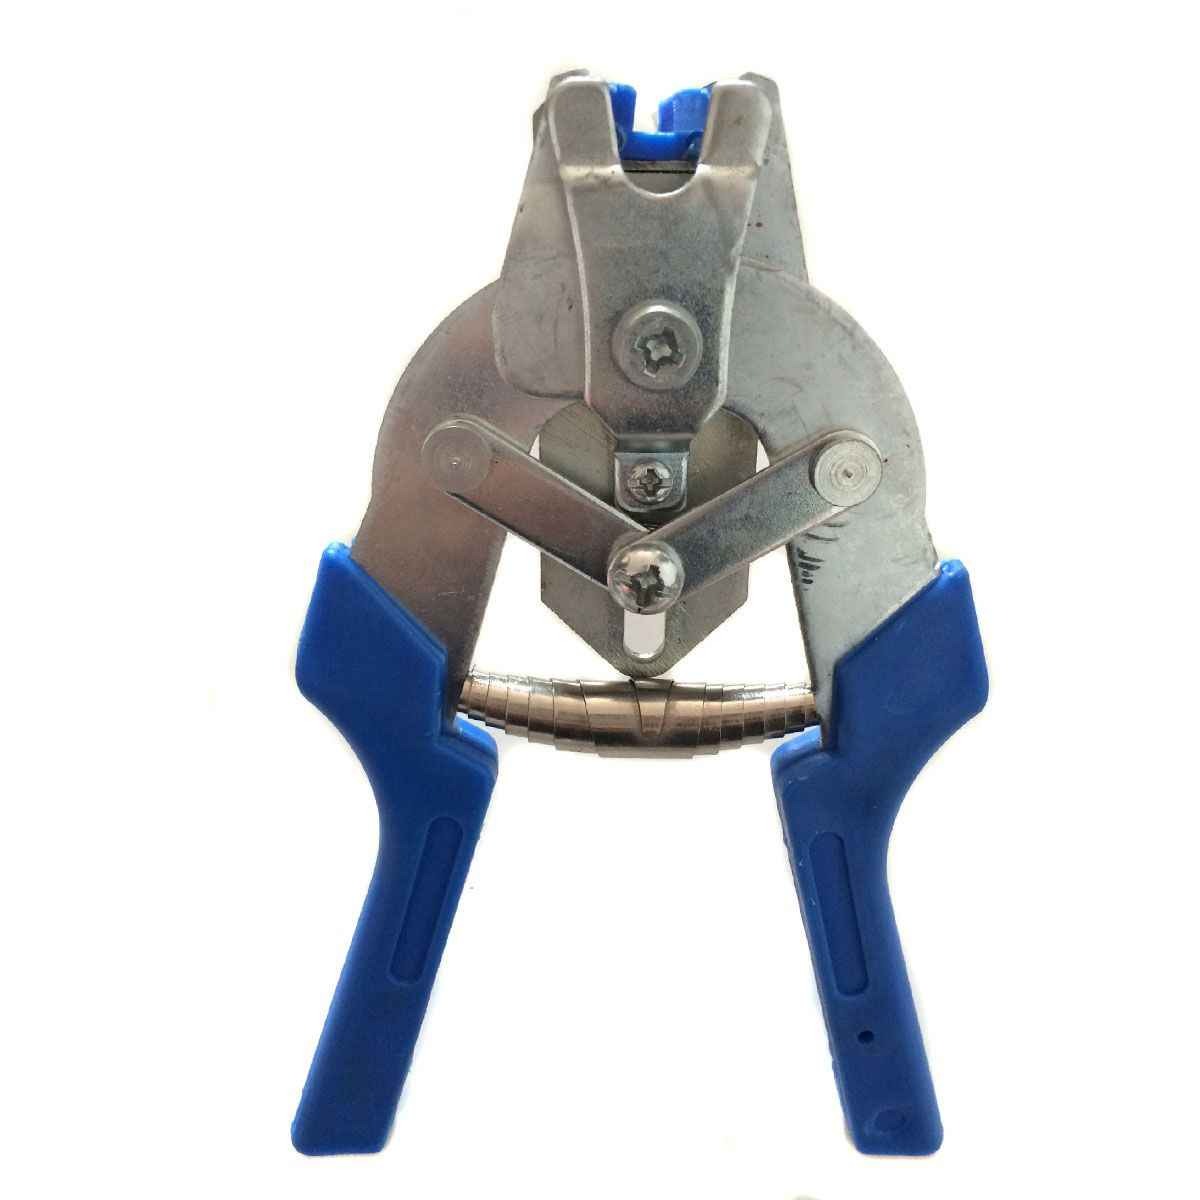 Wsfs 1Pc Hog Ring Tang Tool En 600 Stuks M Clips Kip Mesh Kooi Draad Hekwerk Krimpen Soldeerverbinding lassen Reparatie Handgereedschap